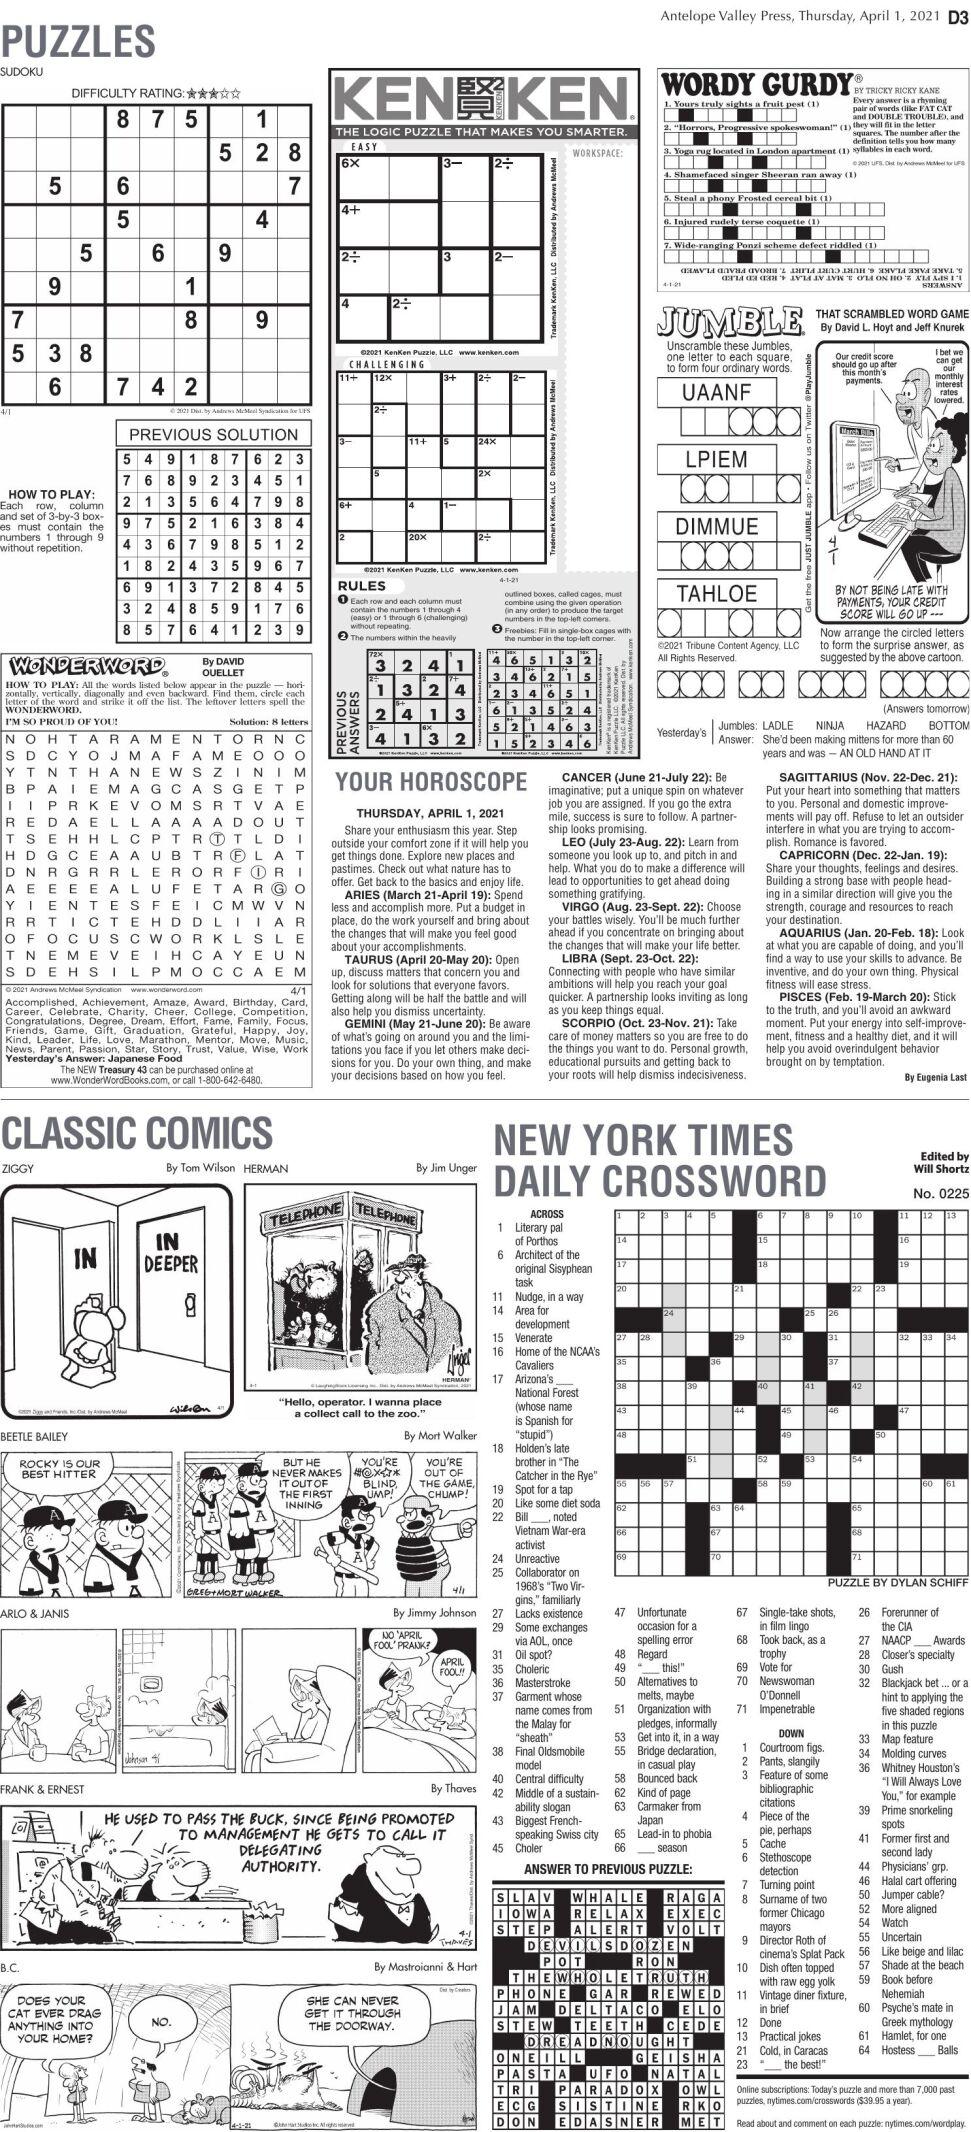 Puzzles, April 1, 2021